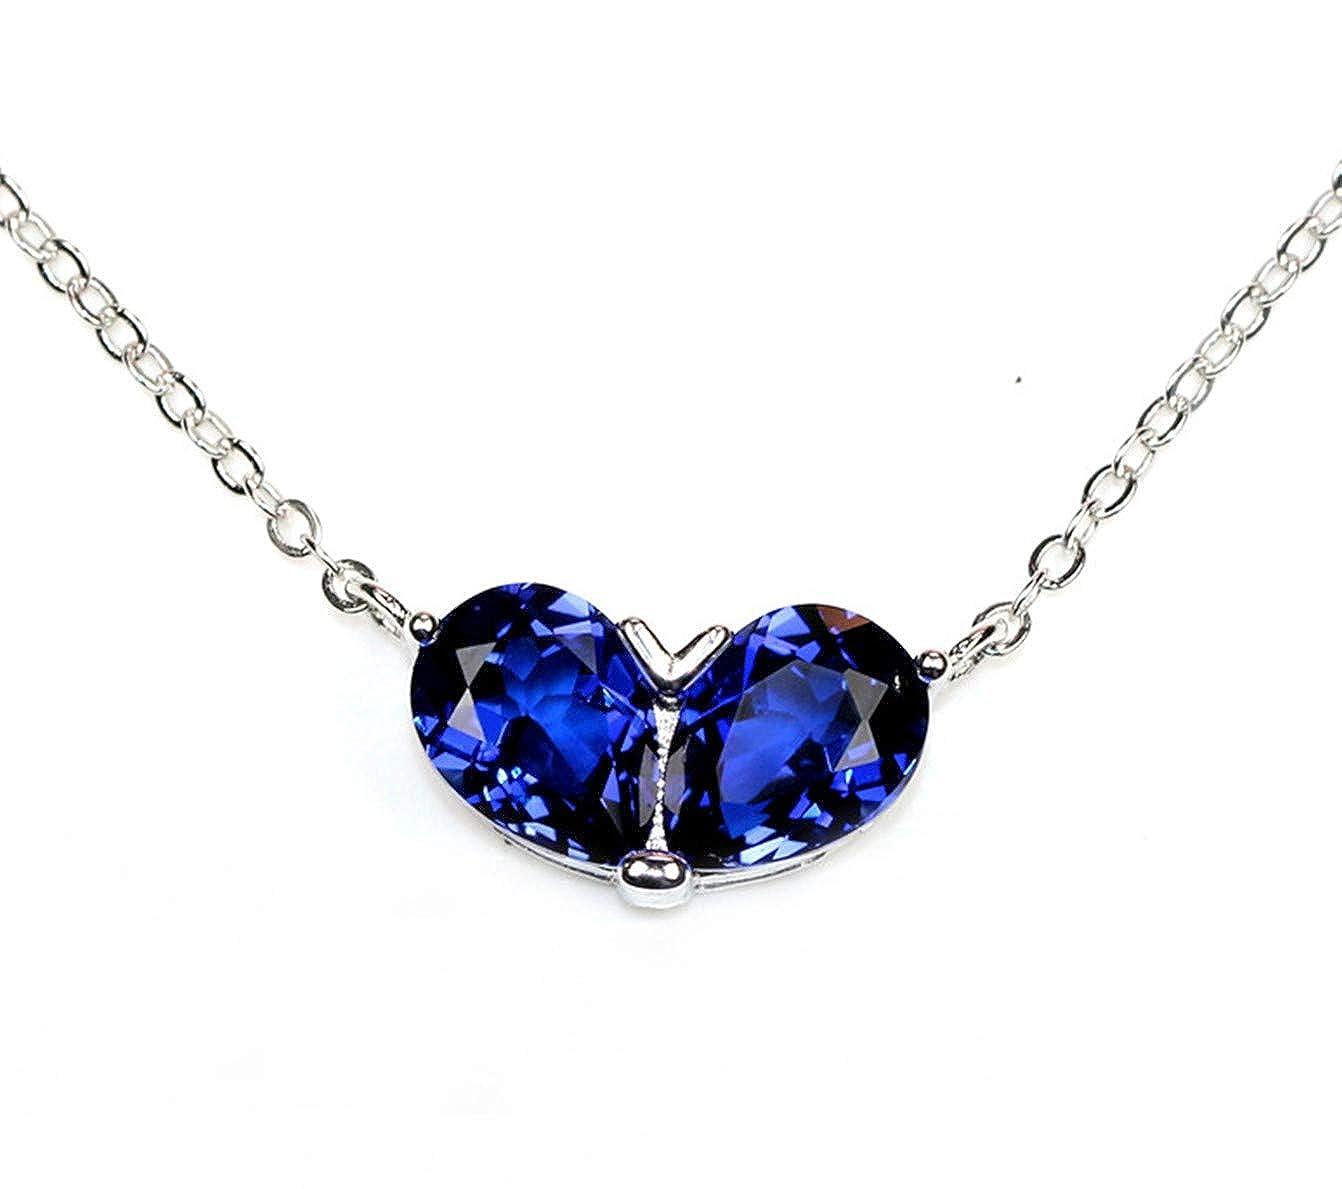 ZHUANBAI Water Drops Double Spell Heart Tanzanite Sapphire Necklace Set Chain Sterling Silver Simple Collarbone Chain Sapphire Blue Color Treasure Gift Girlfriend